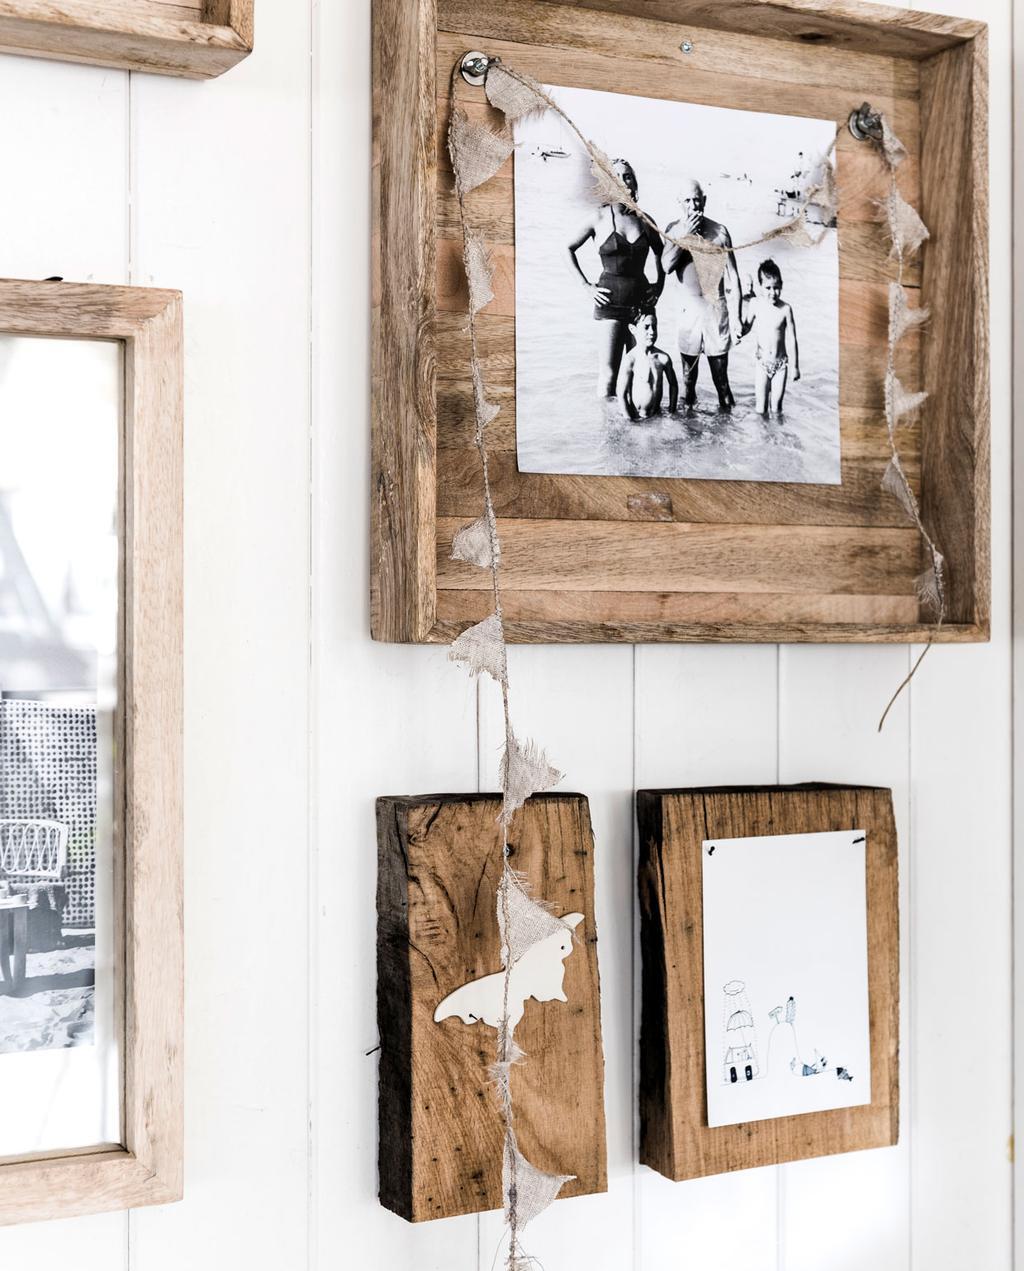 wrakhout fotolijsten bij ajuma restaurant